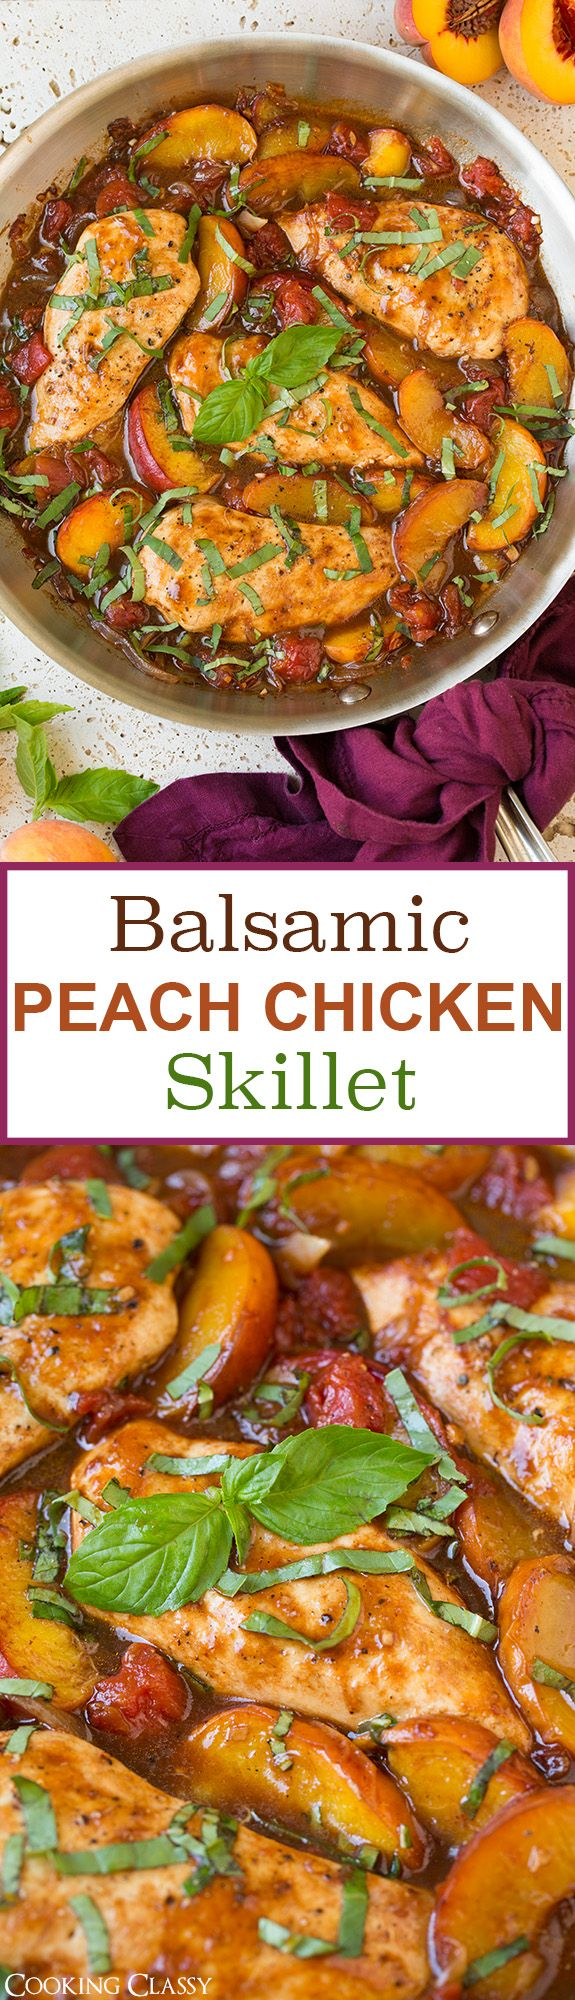 ... Chicken Recipes on Pinterest | Skillet chicken, Chicken and Baked